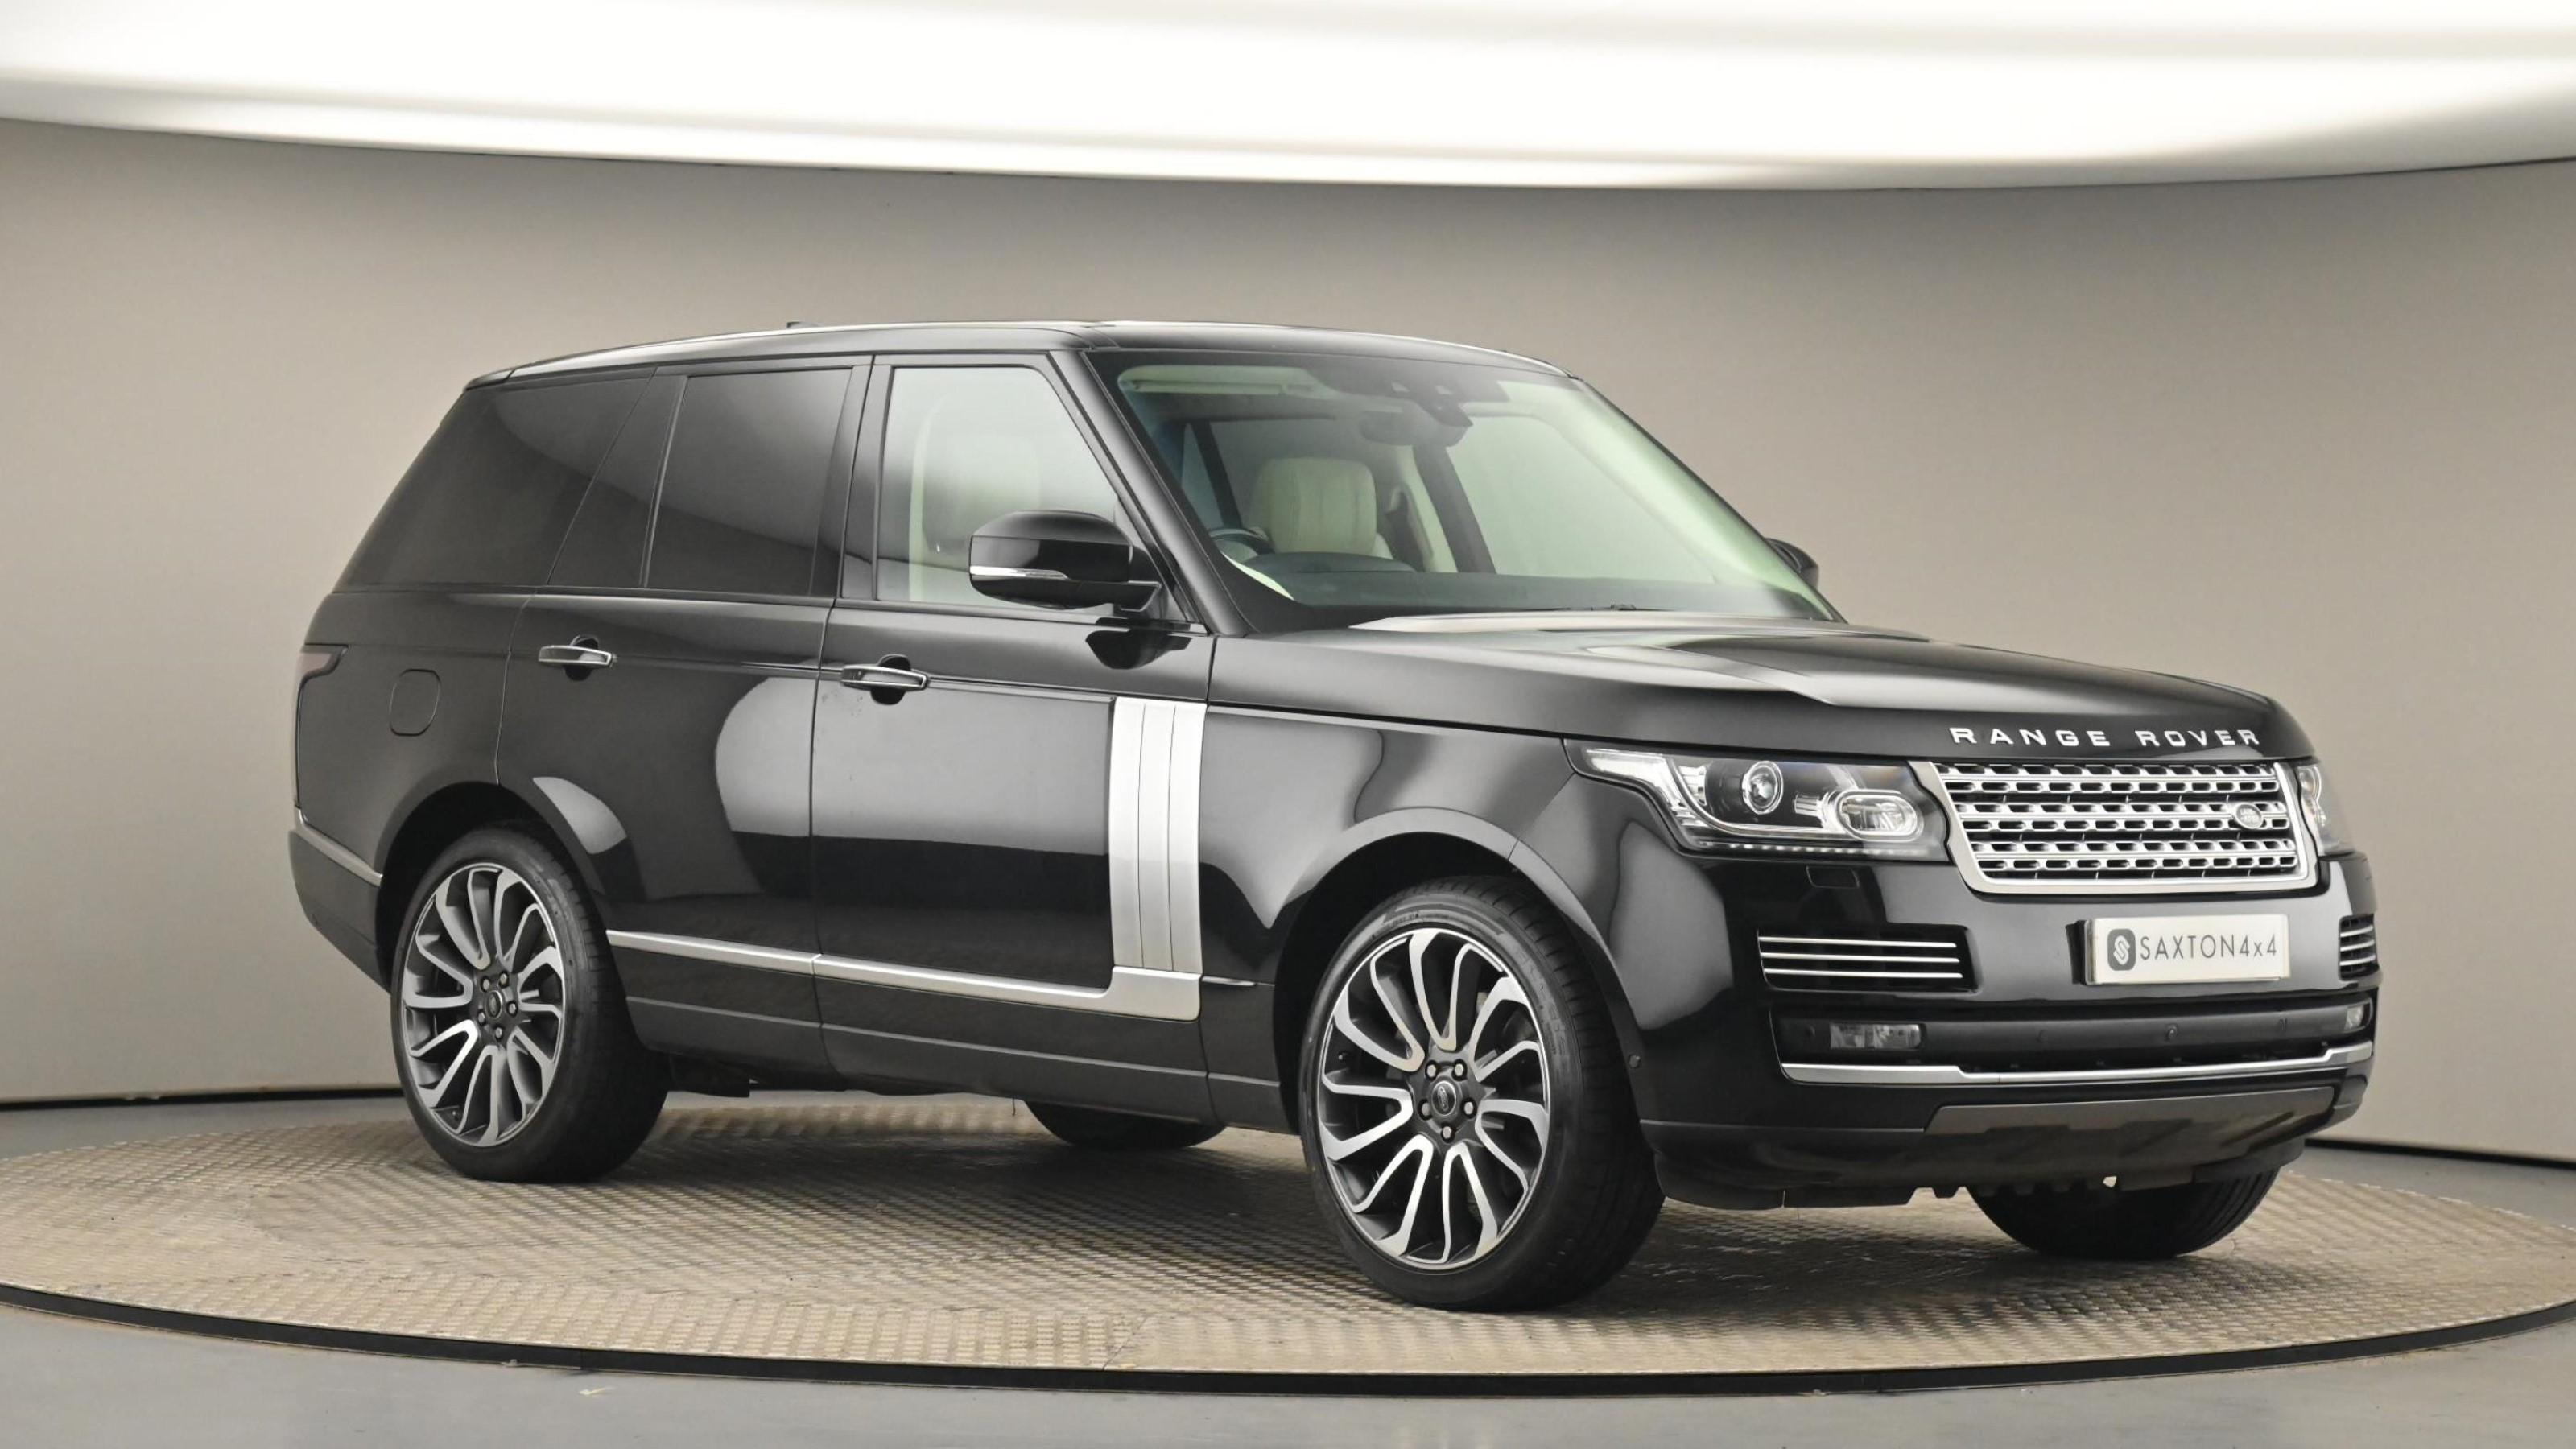 Used 2017 Land Rover RANGE ROVER 4.4 SDV8 Autobiography 4dr Auto BLACK at Saxton4x4